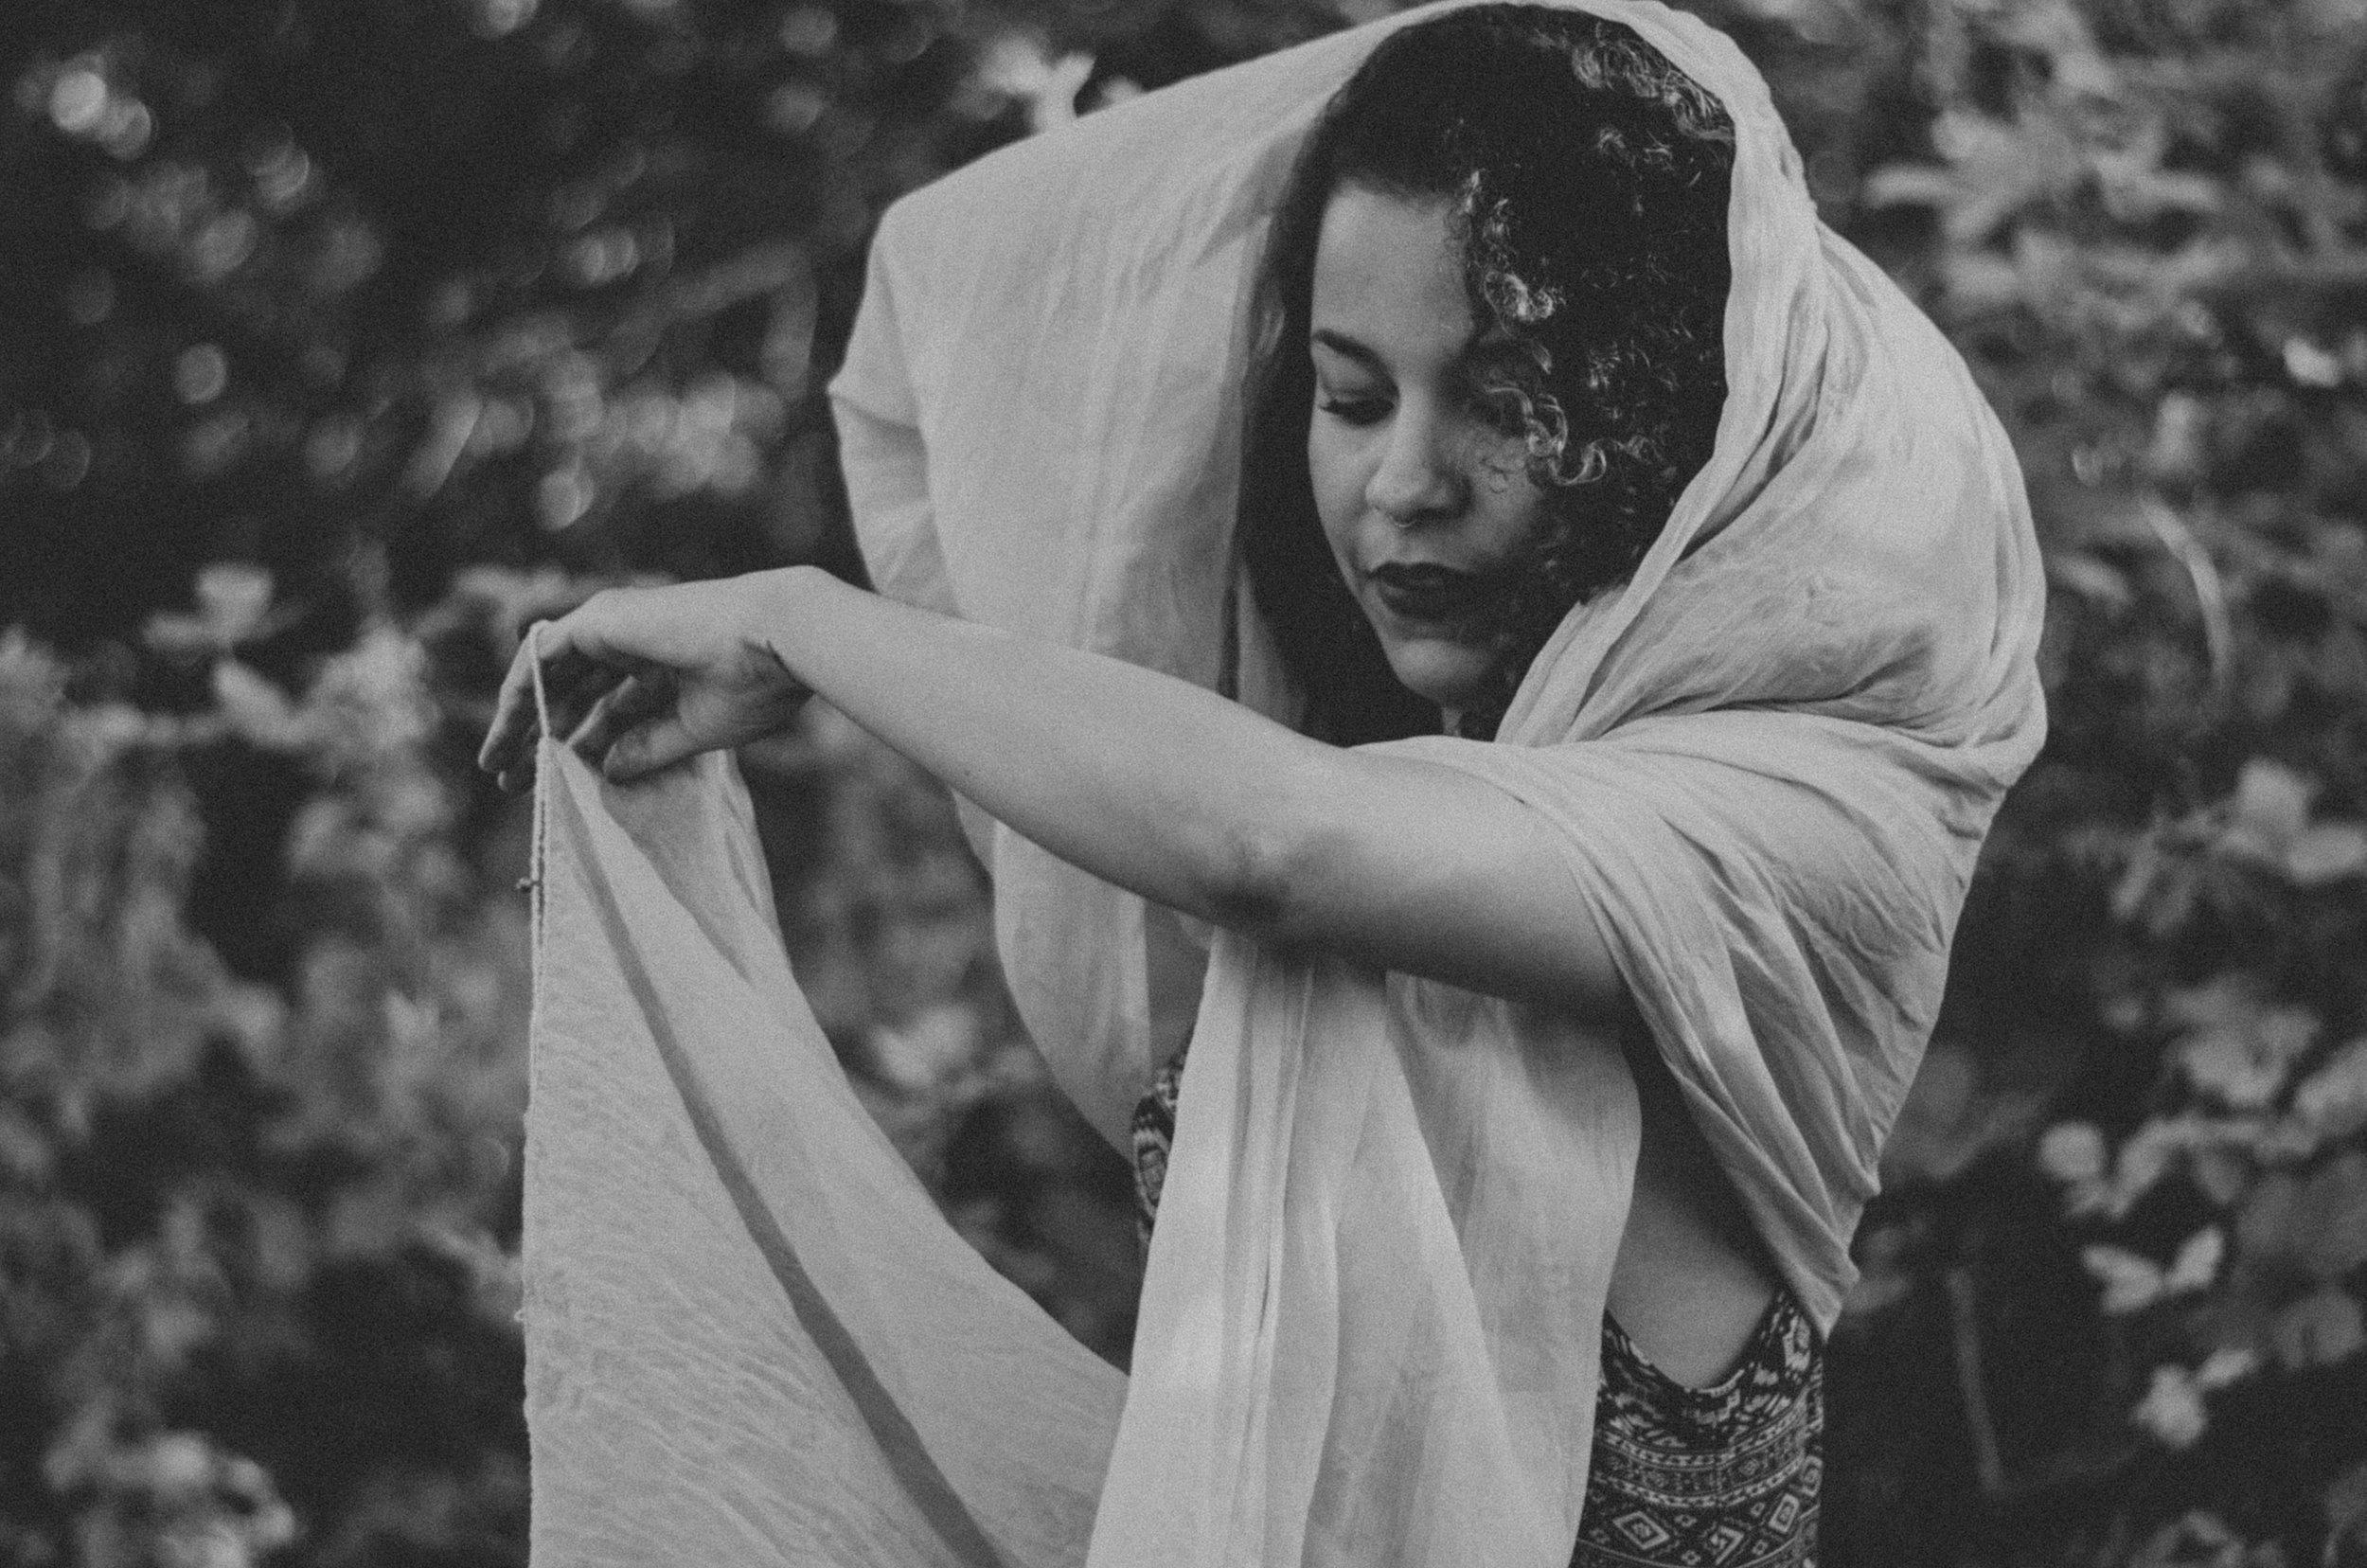 Inka-Portrait-Session-Aiste-Saulyte-Photography-17-07-30-66.jpg